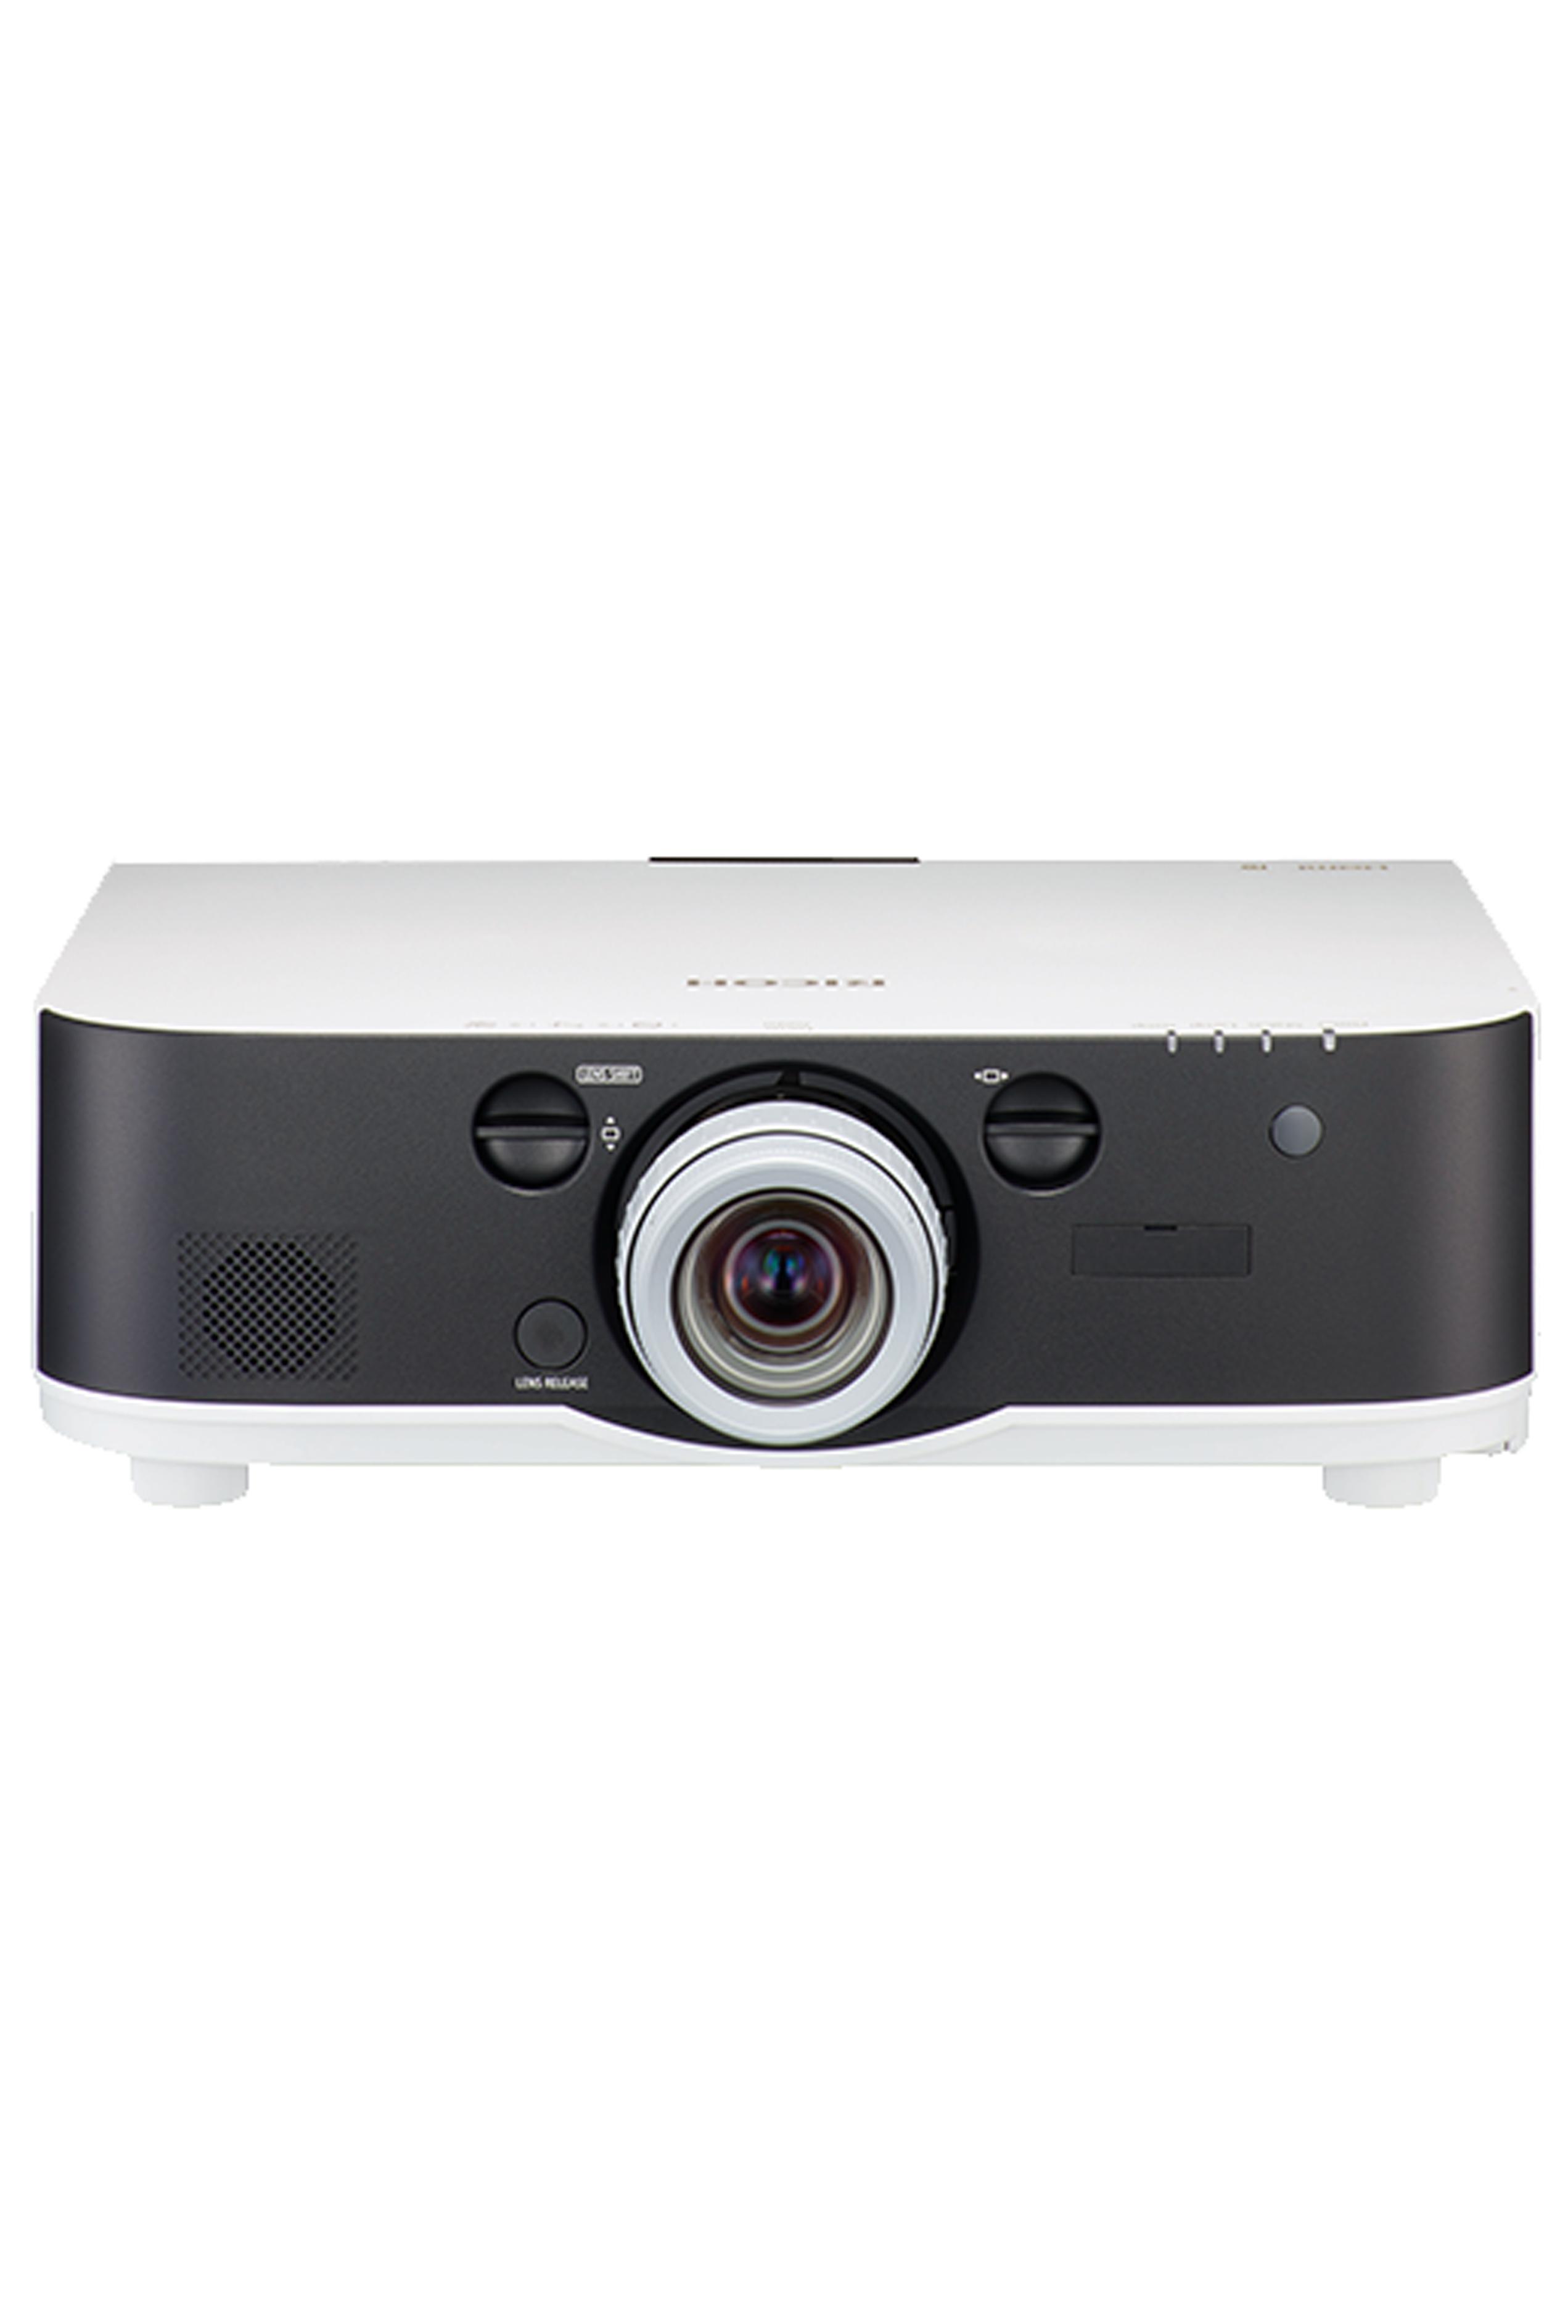 Ricoh PJ WX6181N High End Projector